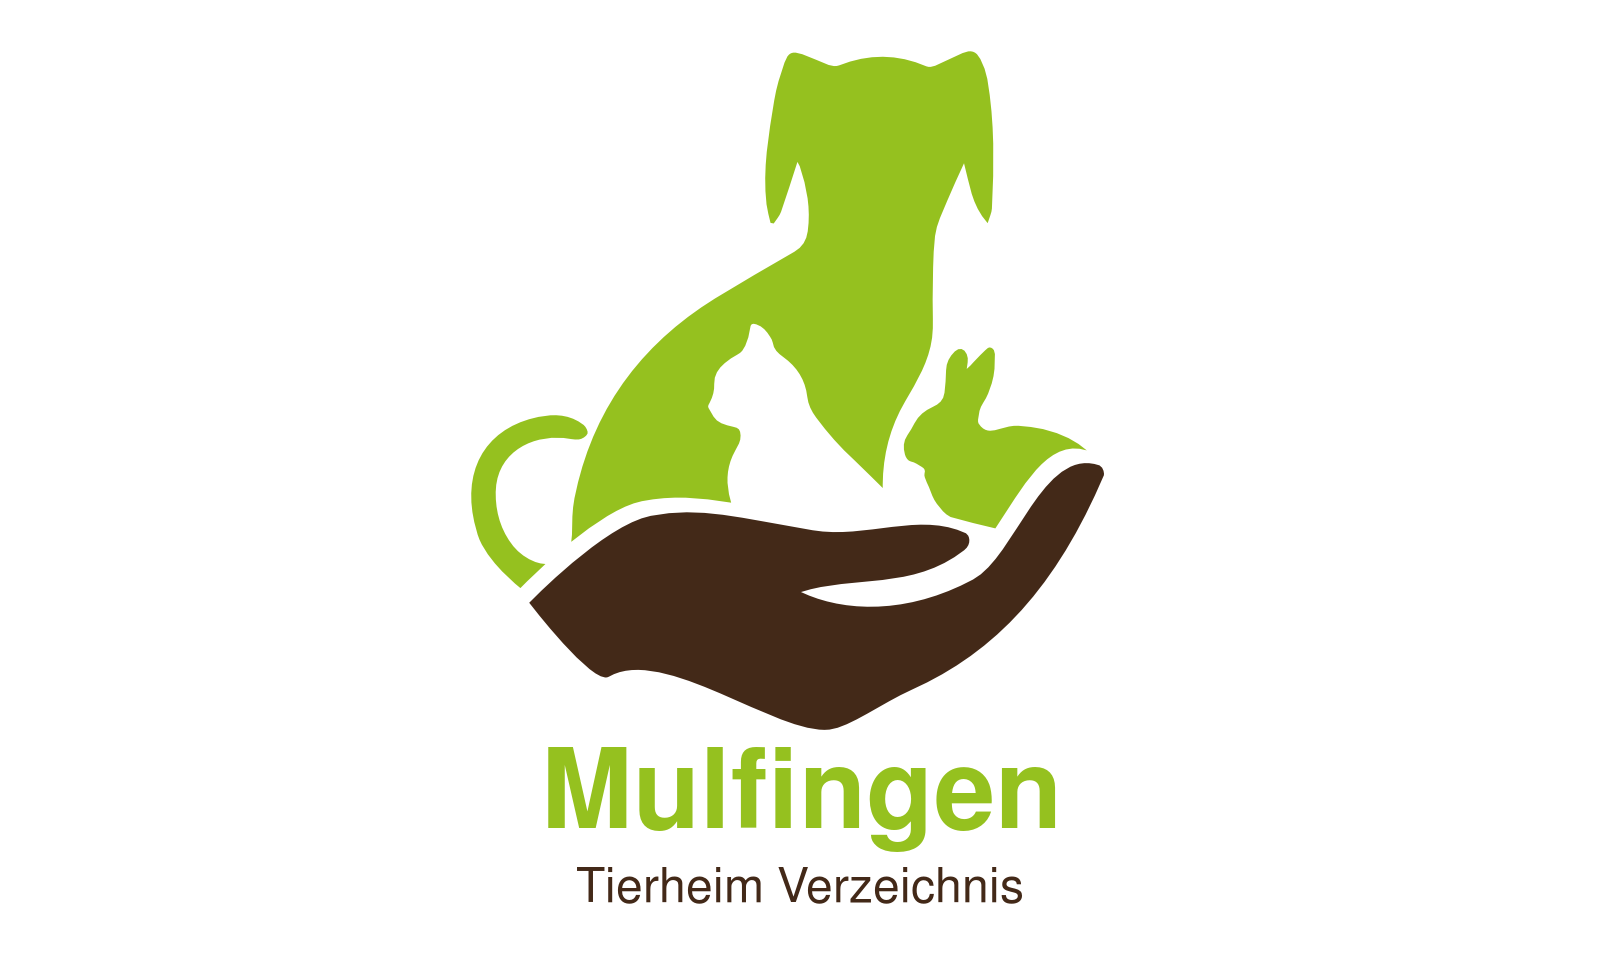 Tierheim Mulfingen